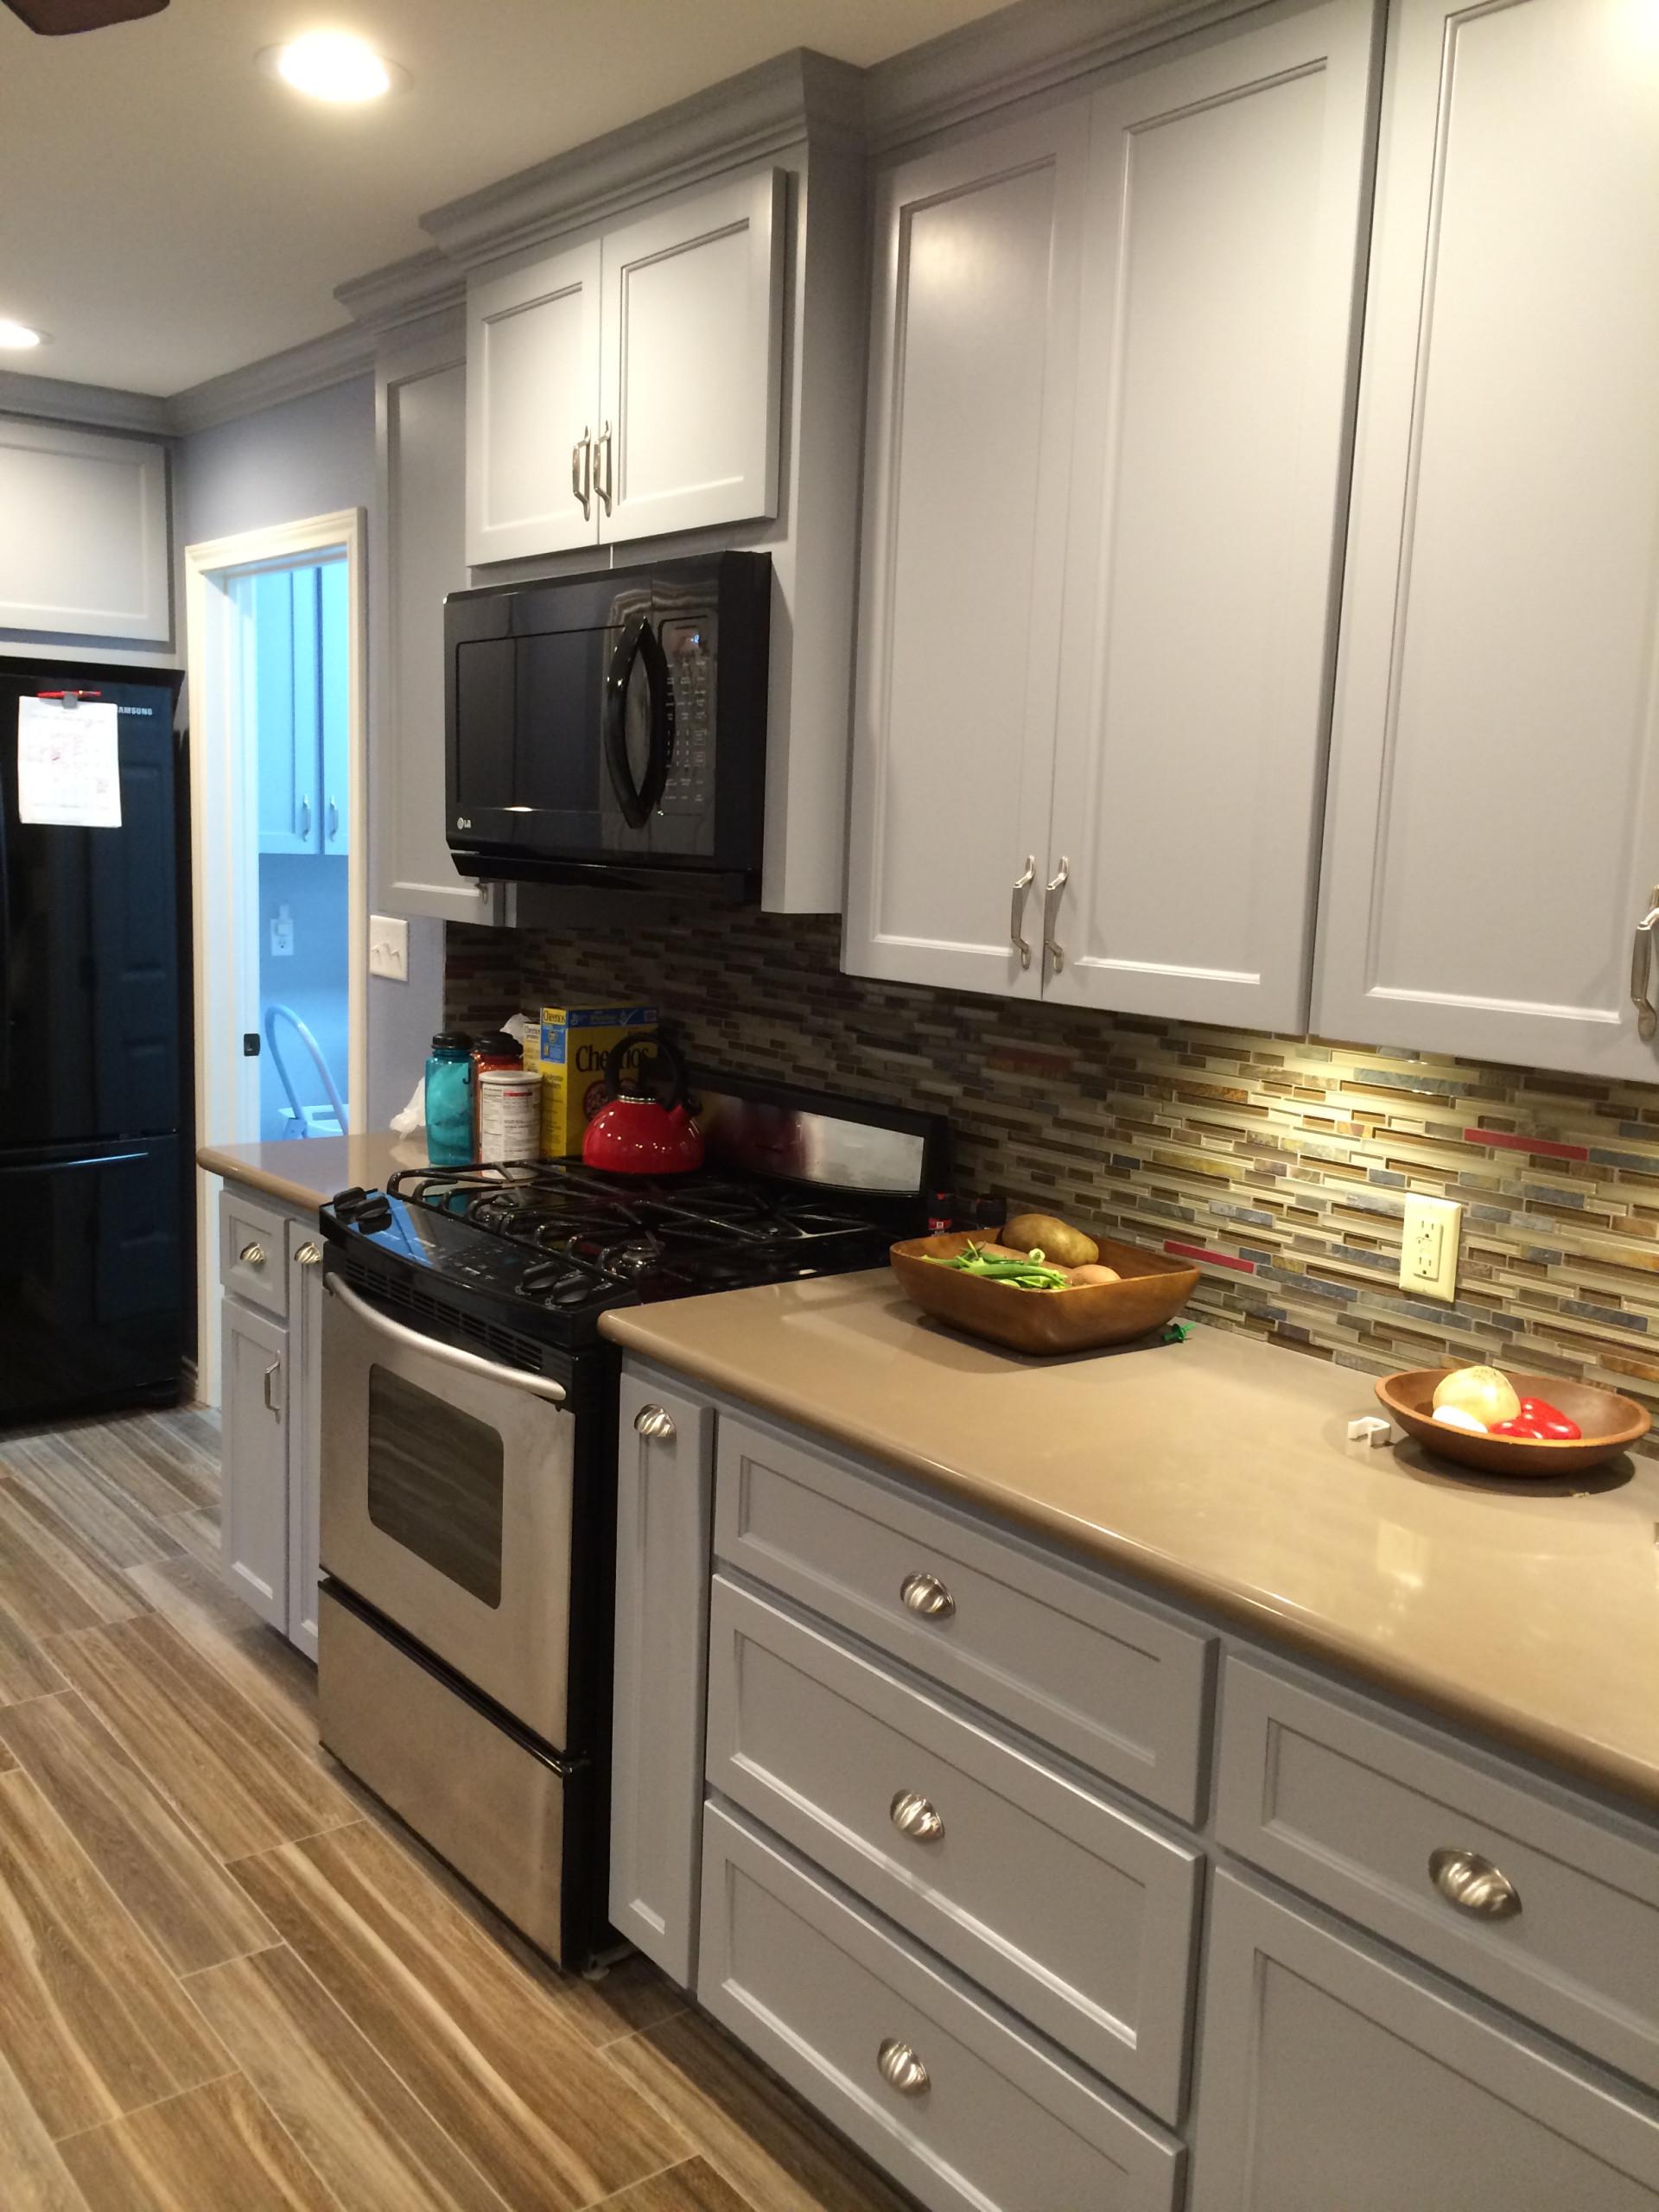 Sweeny - Kitchen / Bathroom Remodel - 2014